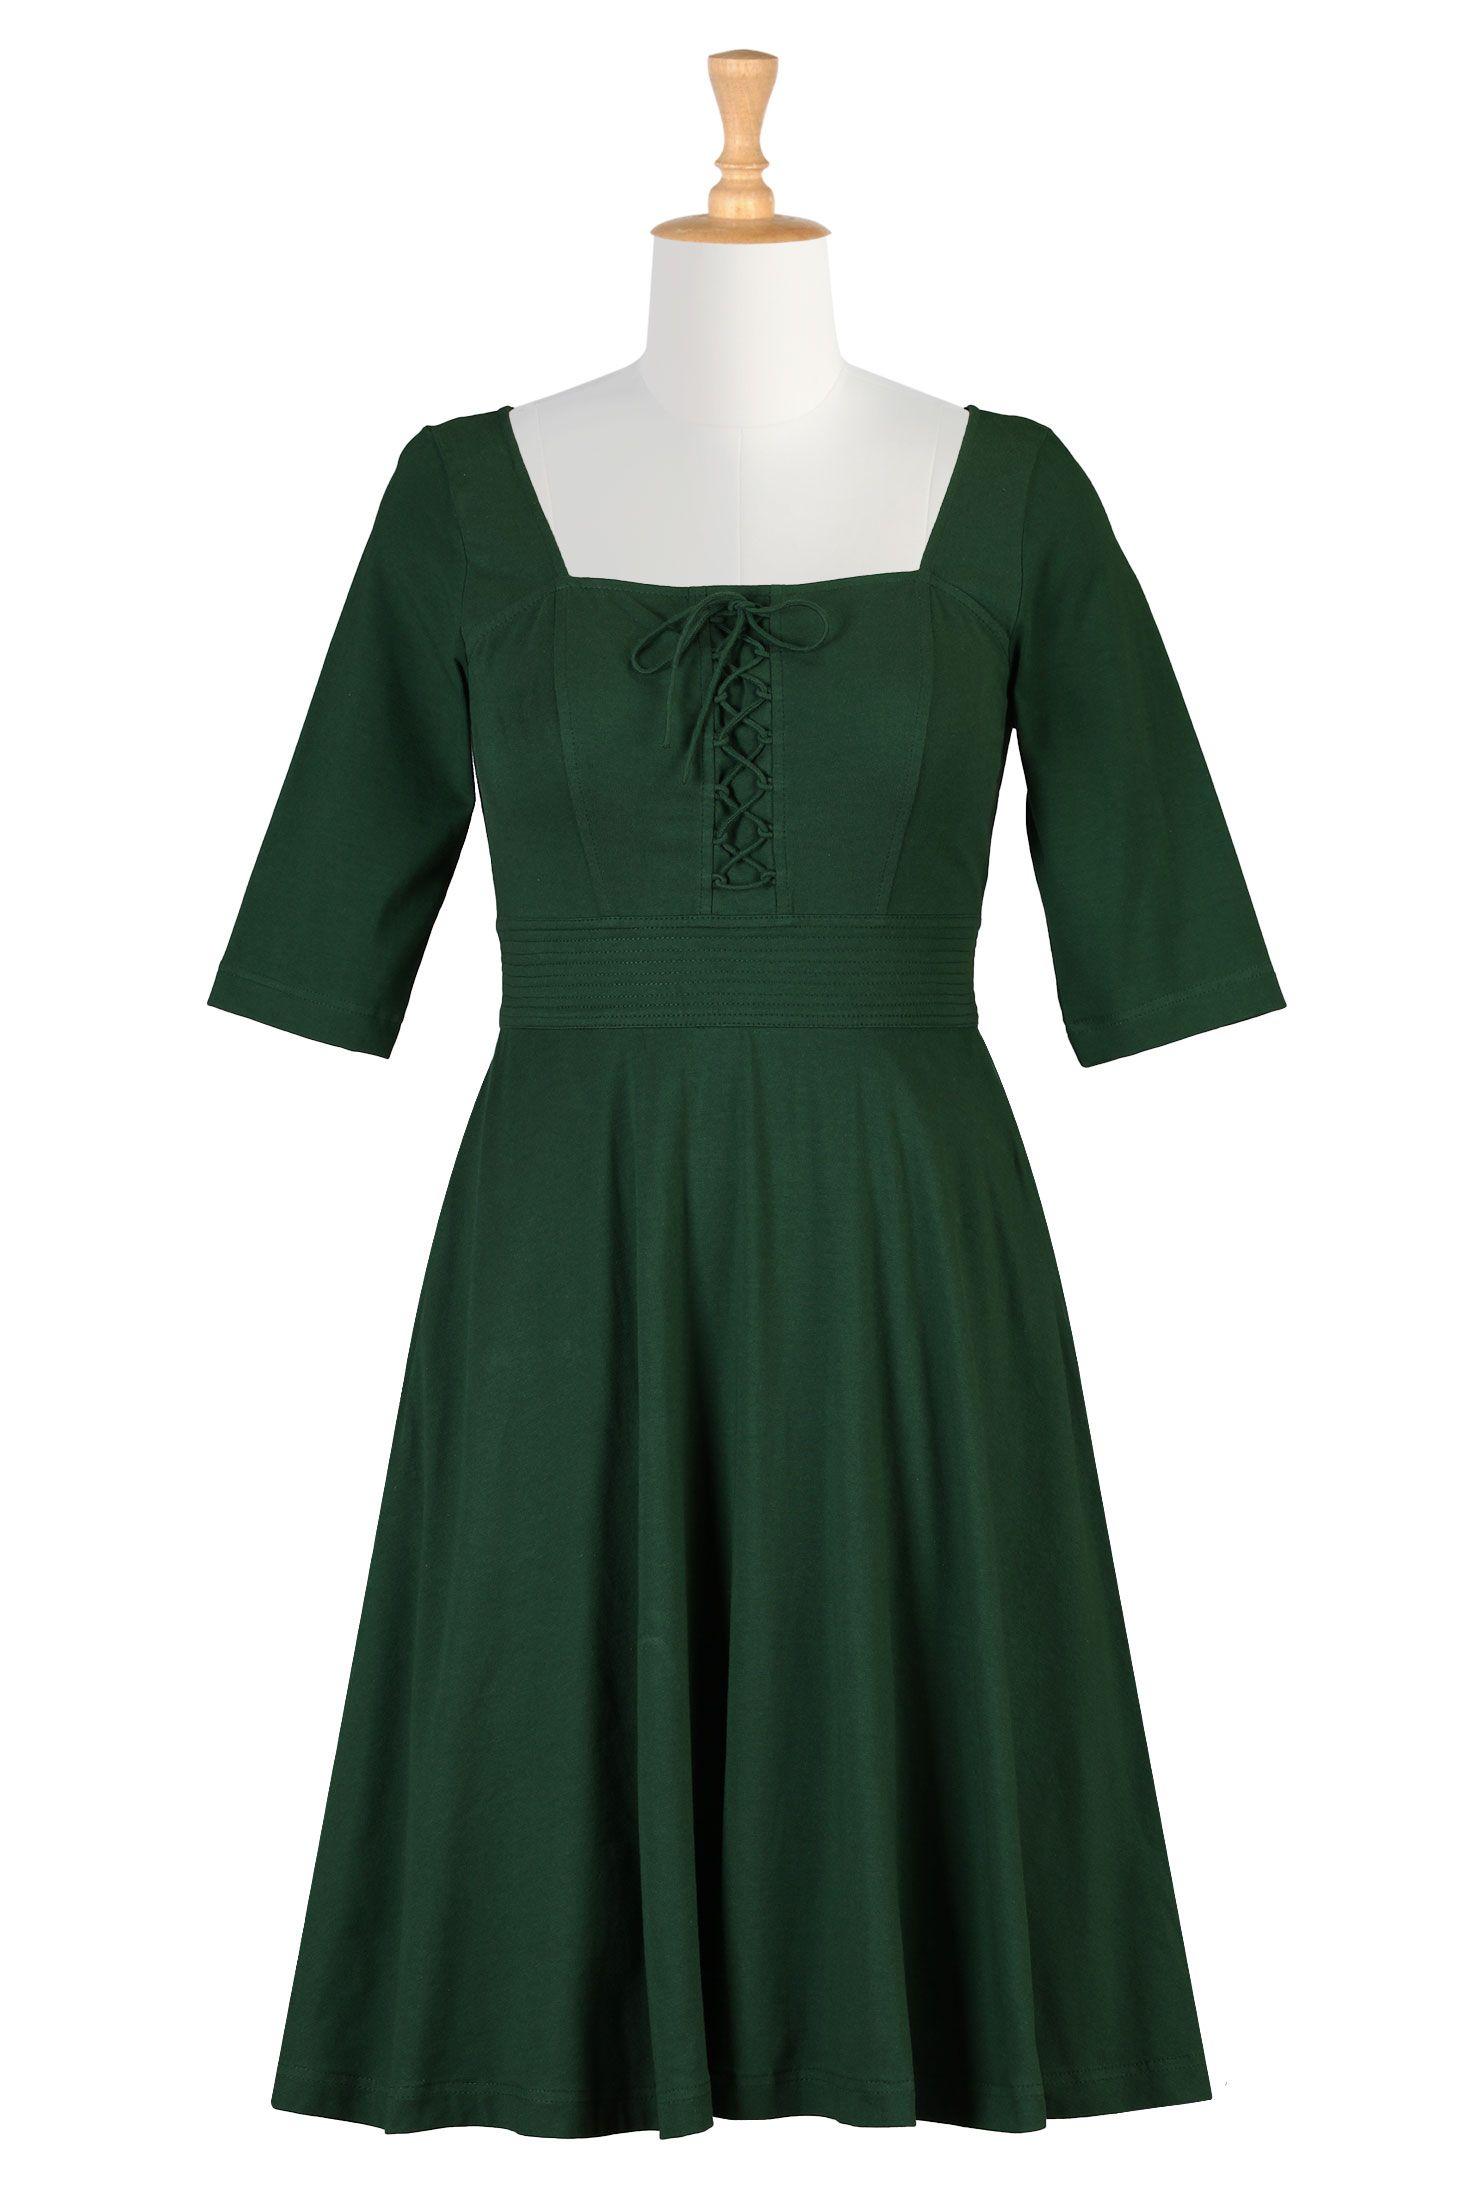 fd52b6674988 Bottle Green Cotton Knit Dresses